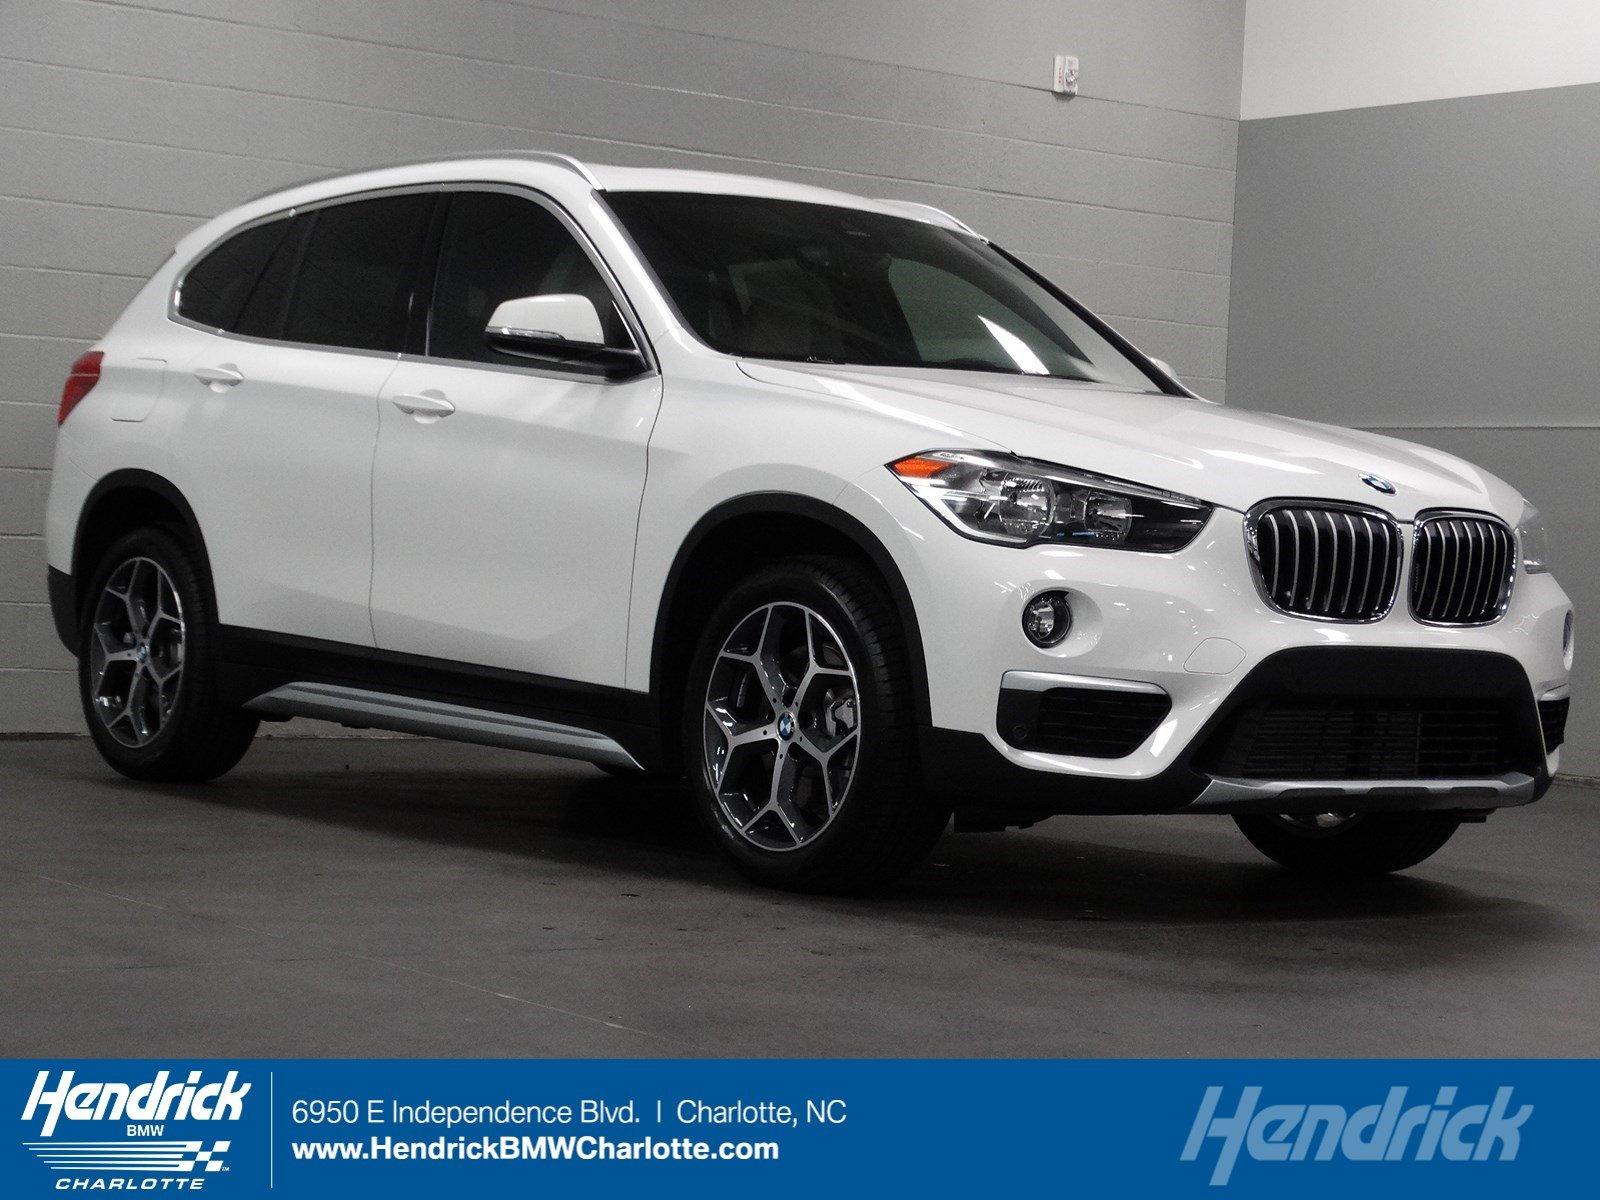 2019 BMW X1 SUV